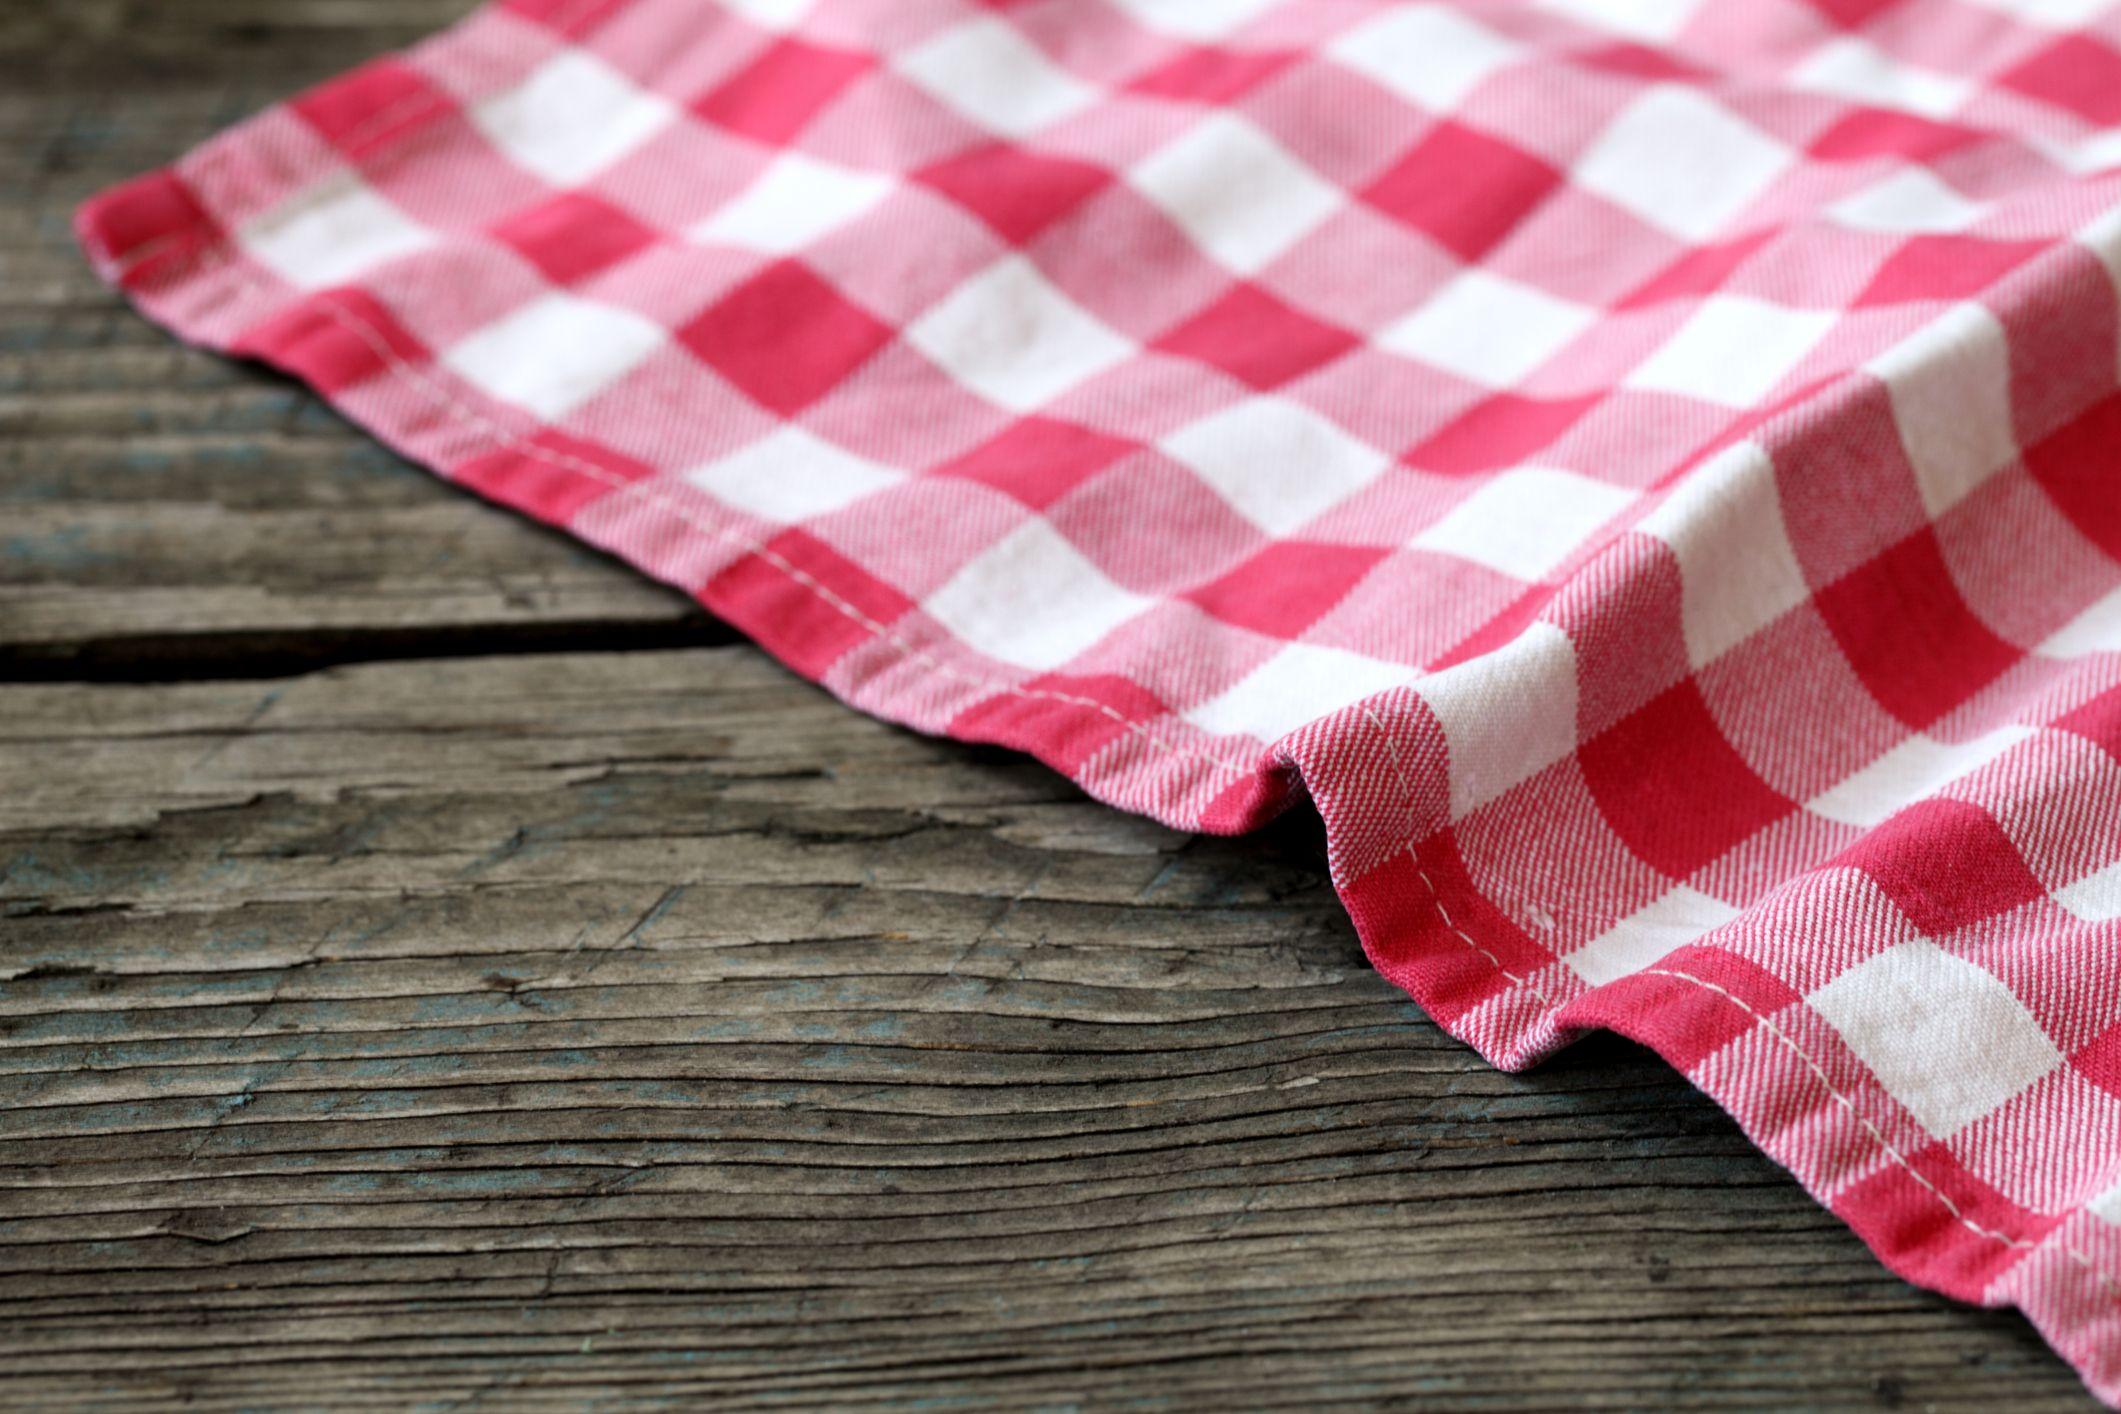 Tablecloth on a table.